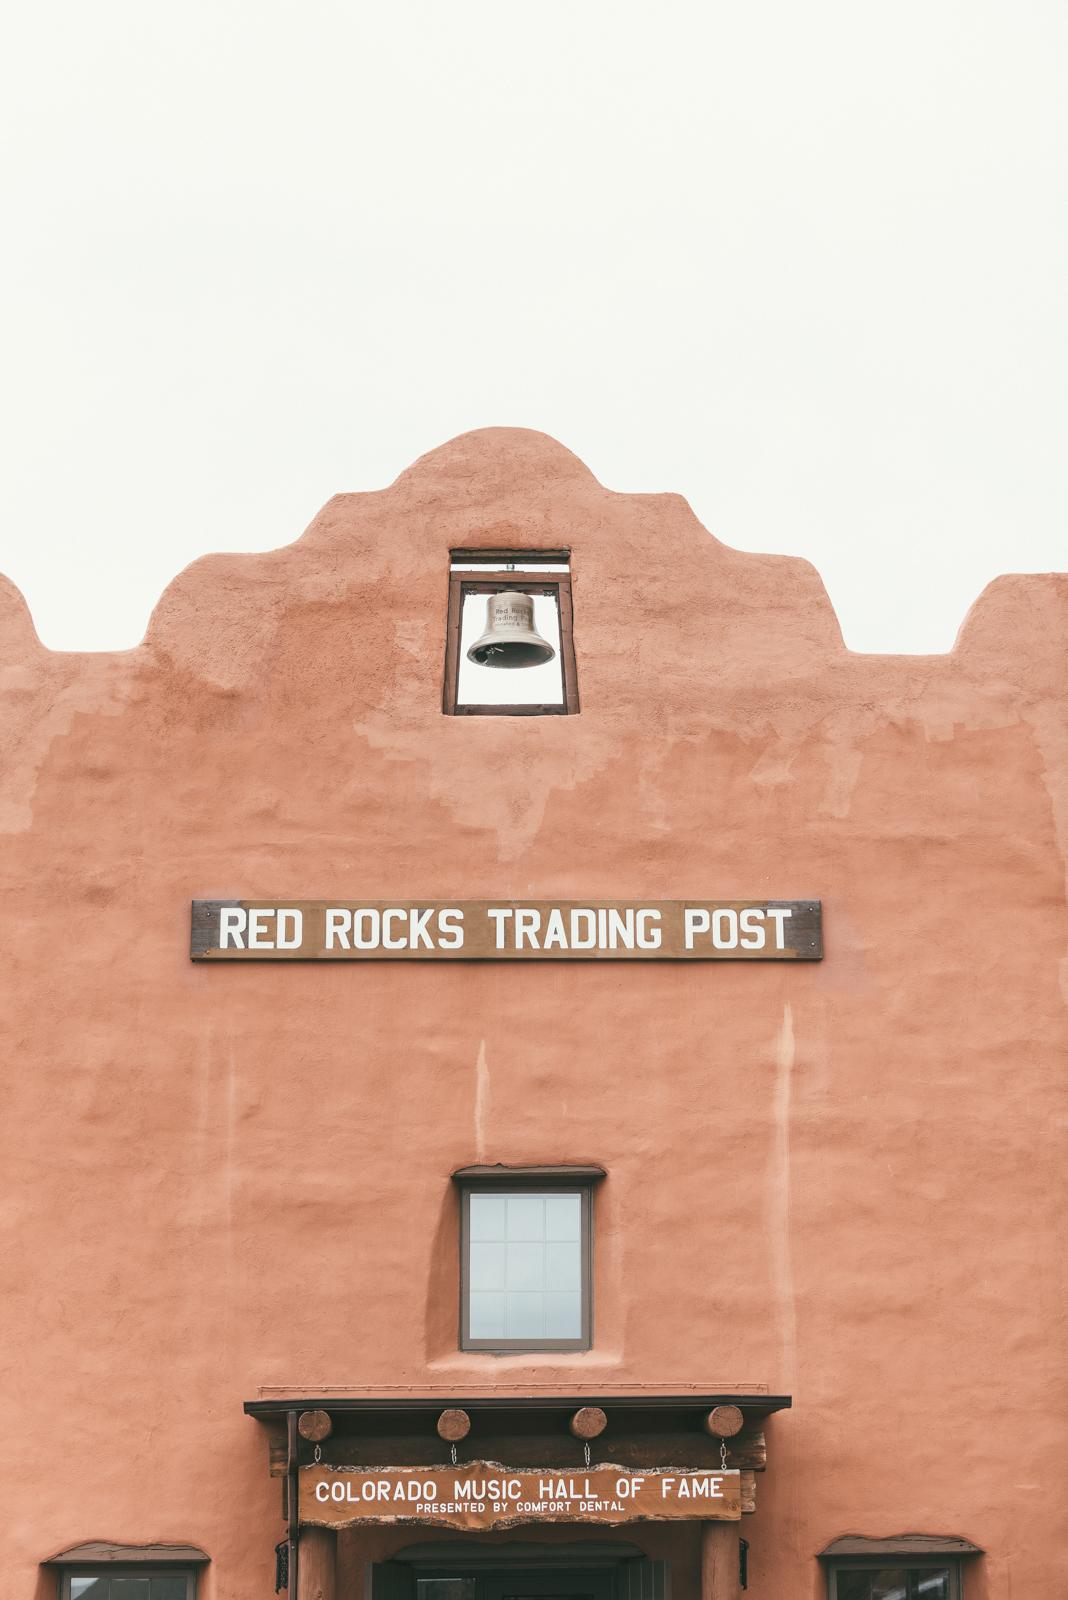 ChadFahnestockPhotography_kyle_kathrine_red_rocks-003.jpg